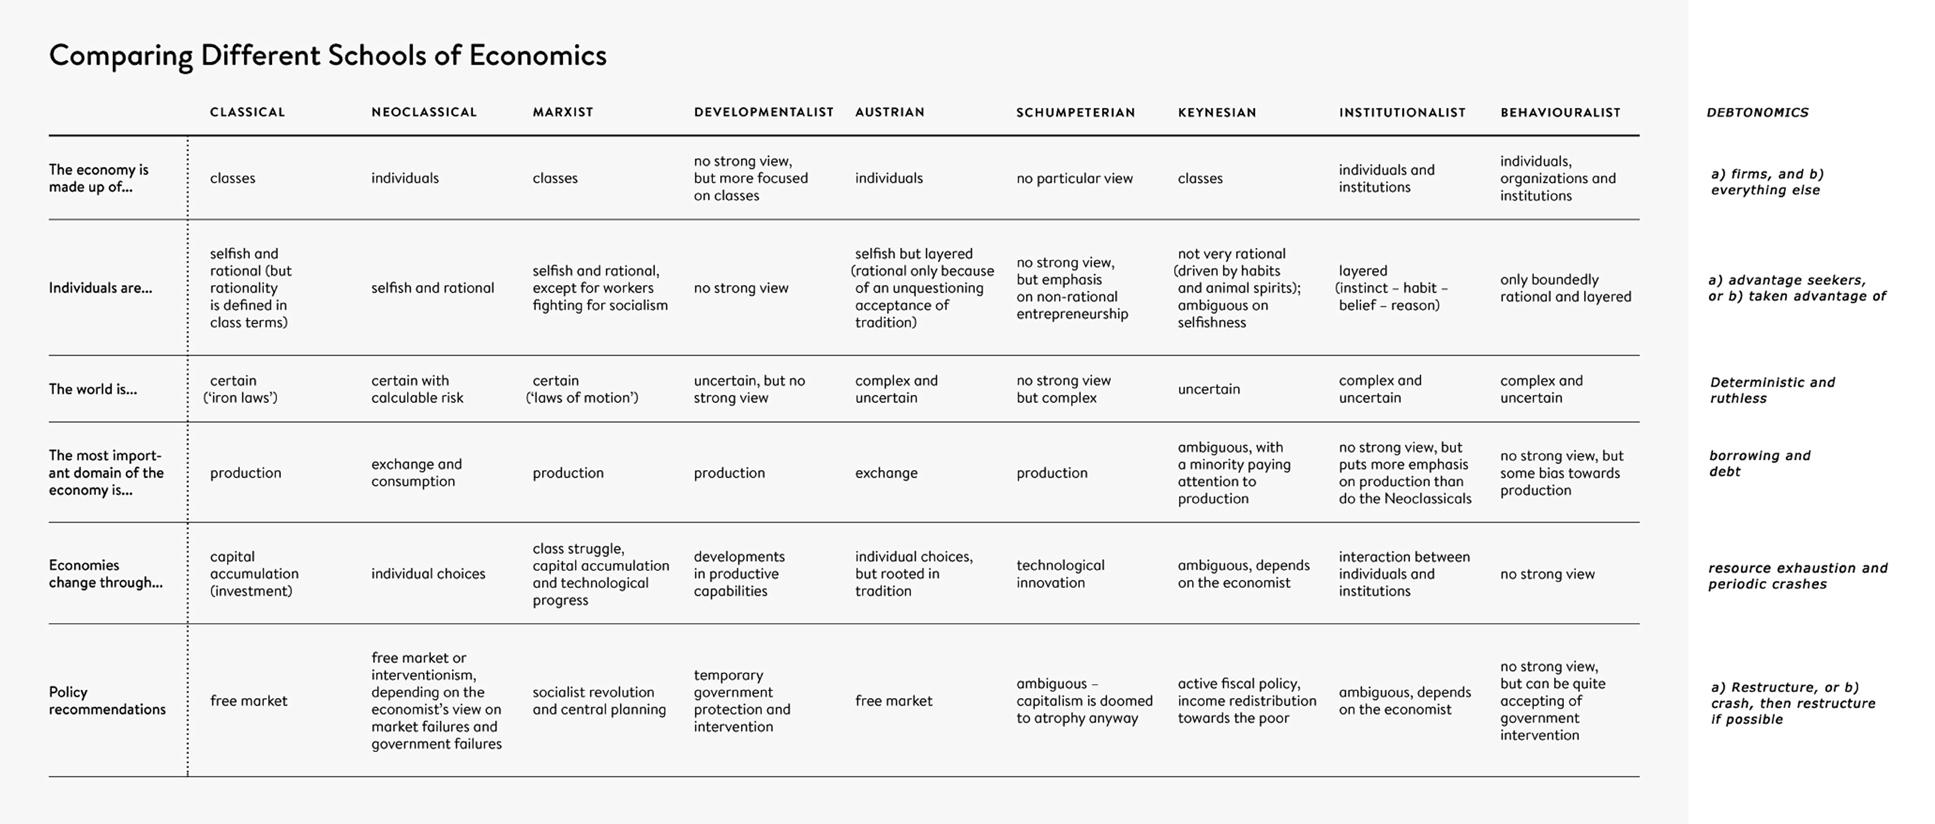 Debtonomics Comparison To Other Ideologies